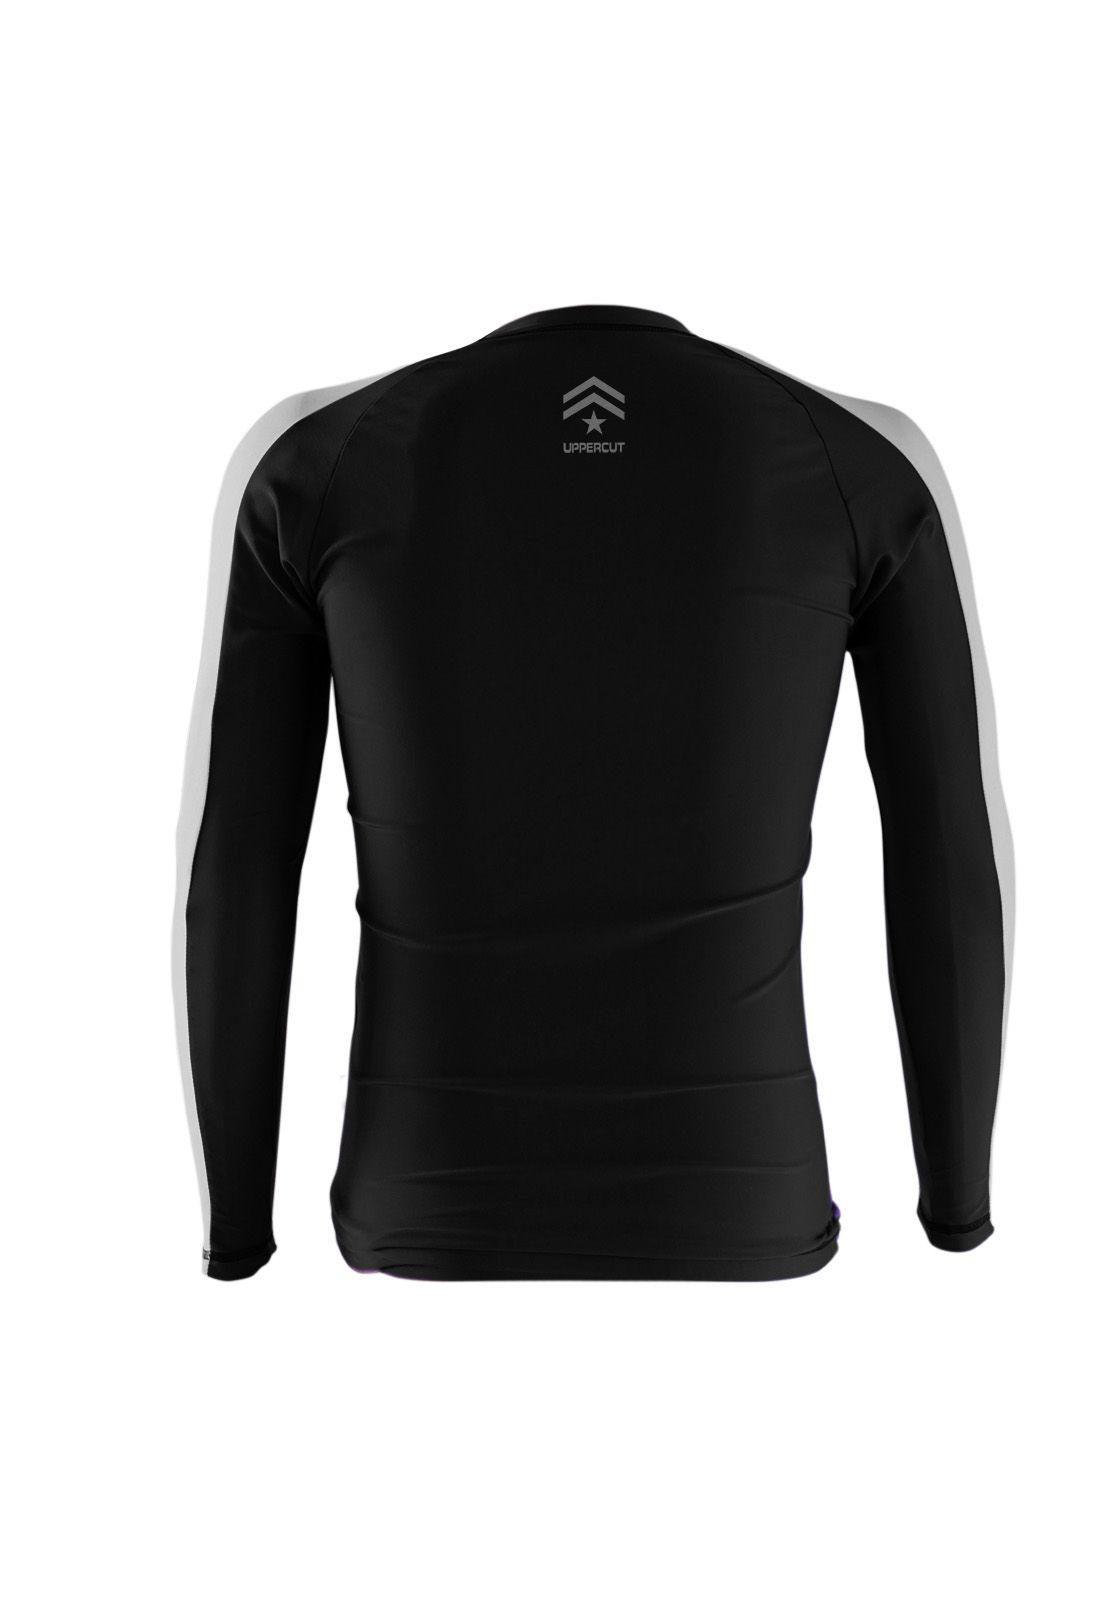 Camisa Rash Guard Justiceiro War R-1 - Preto/Branca - Uppercut  - Loja do Competidor